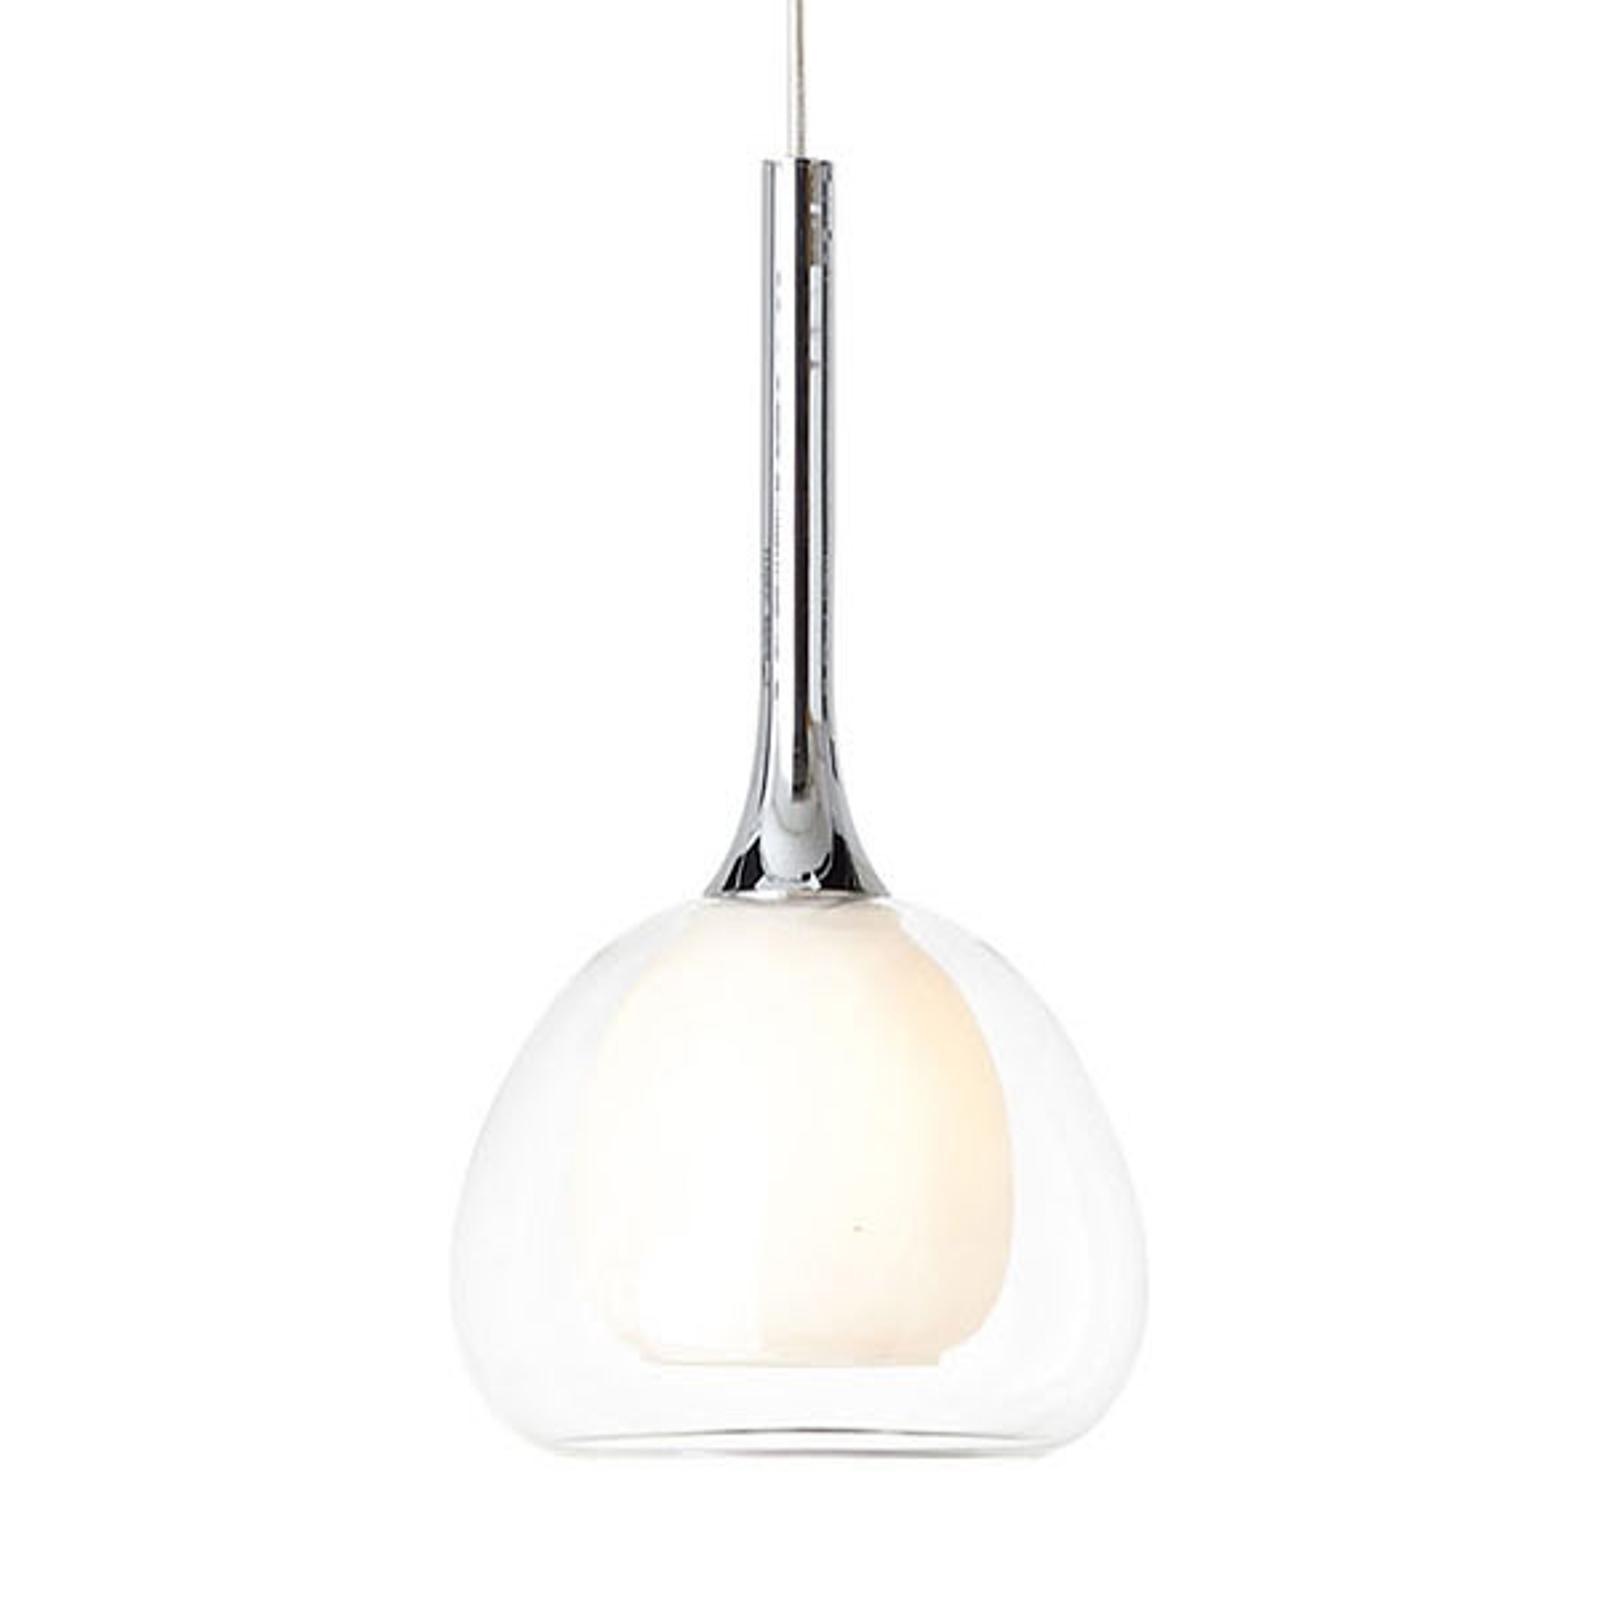 Hanglamp Hadan, 1-lamps glas wit/transparant